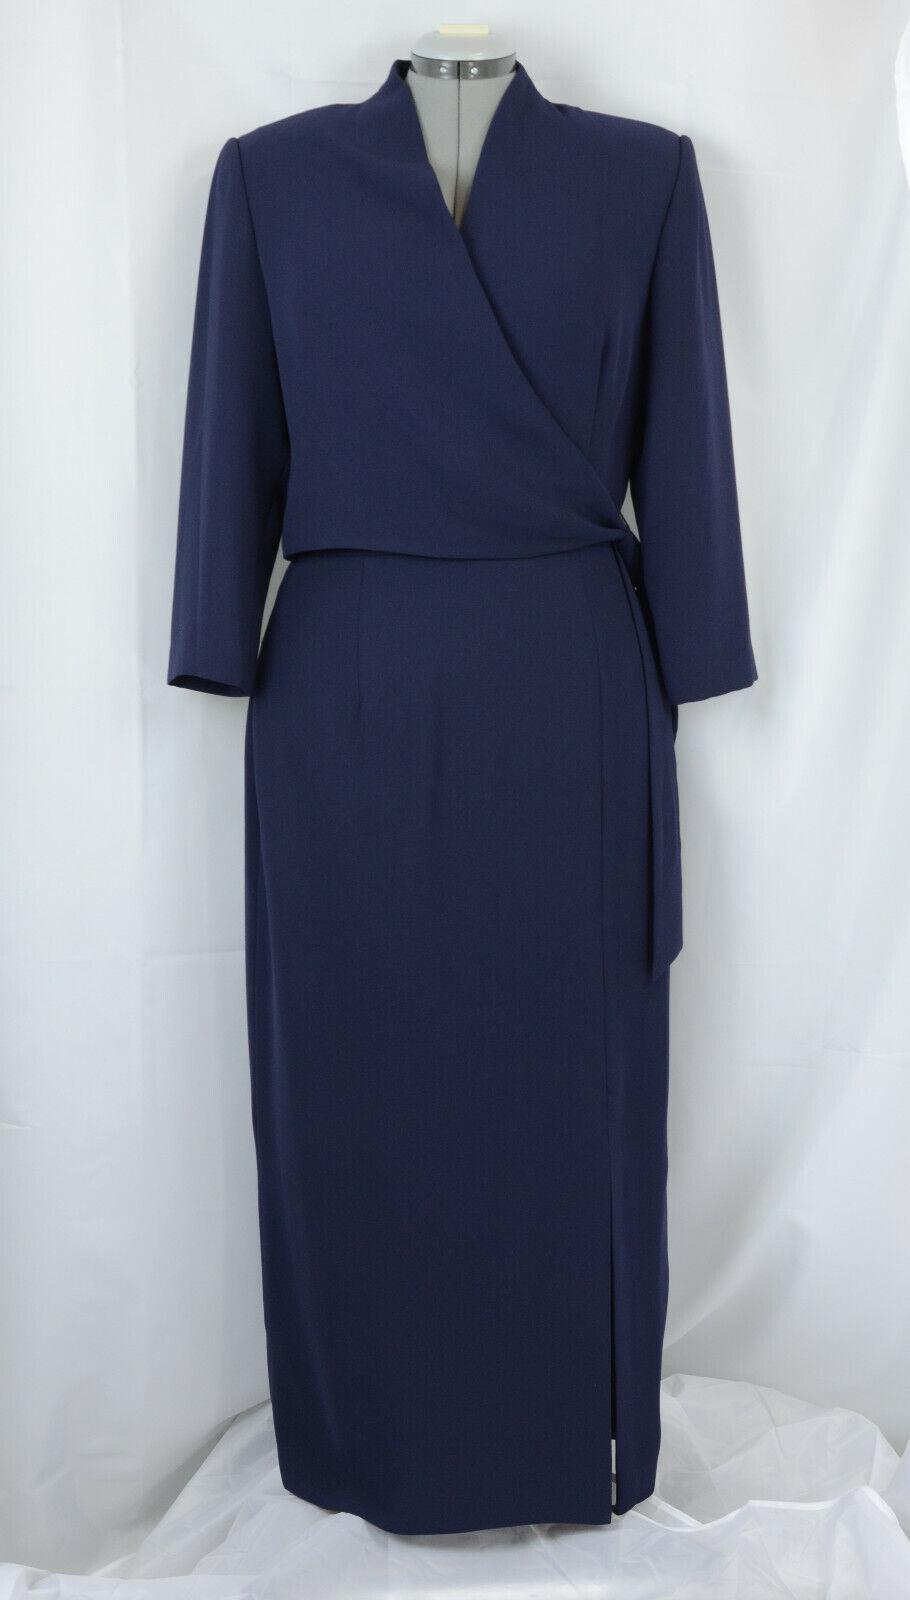 women Morgan Dress Womens 12 Full Length bluee Faux Wrap Wrap Wrap Dress Poleyster Vintage c41822